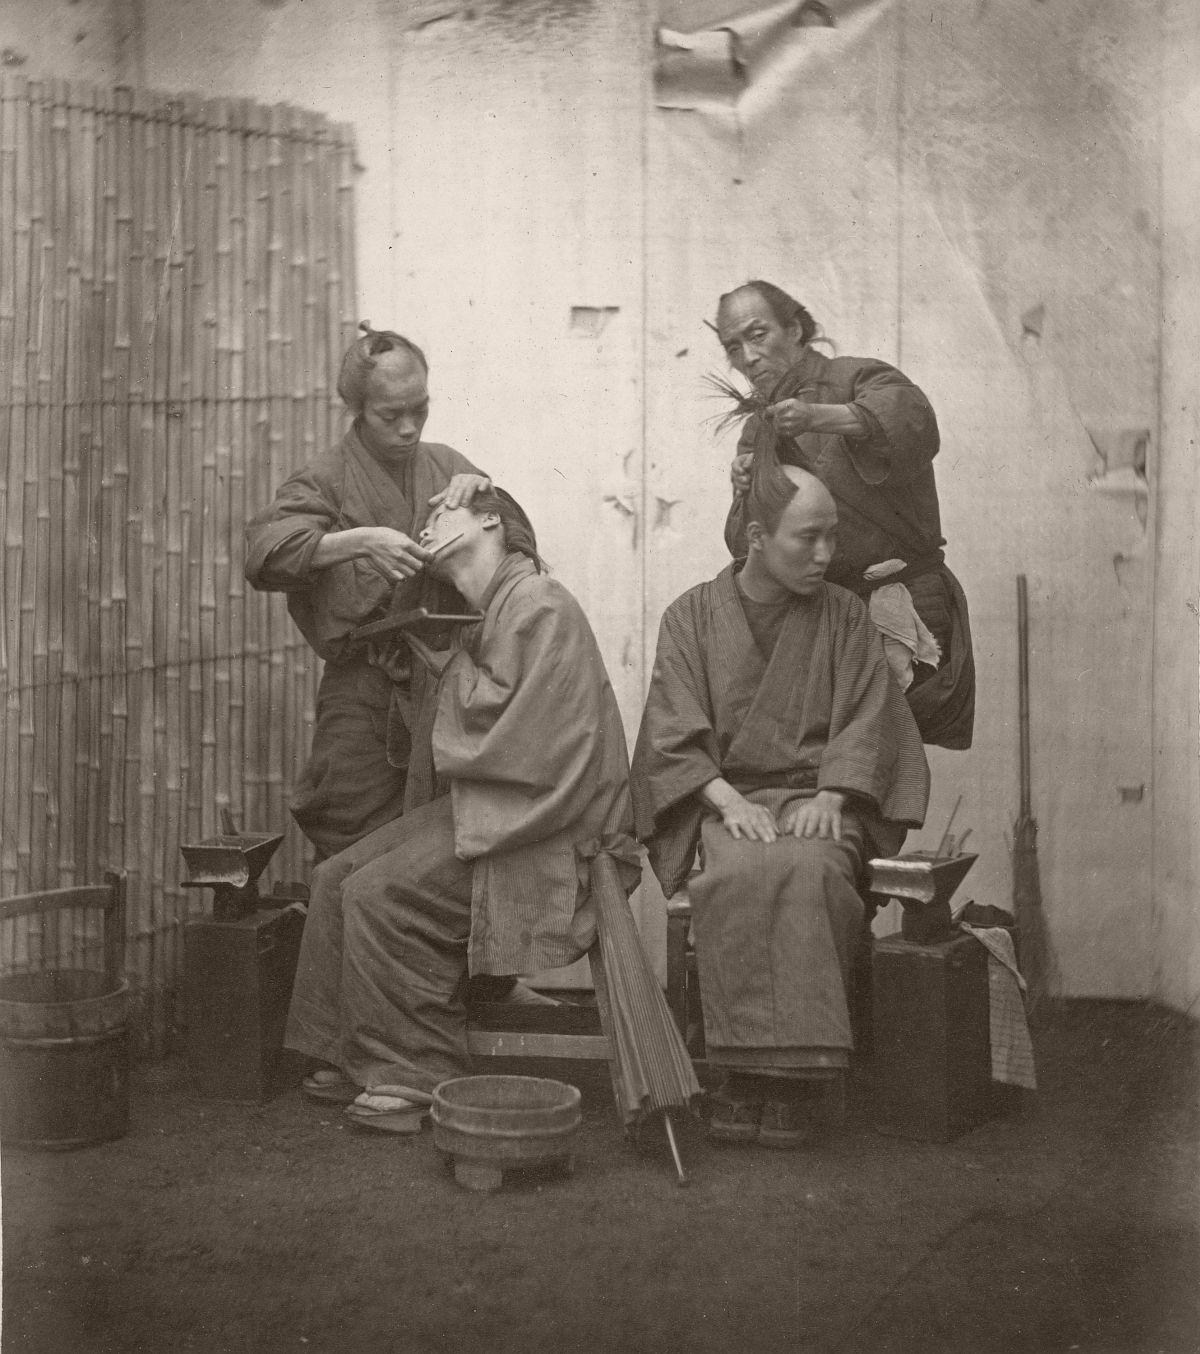 Barbers, Japan, 1868